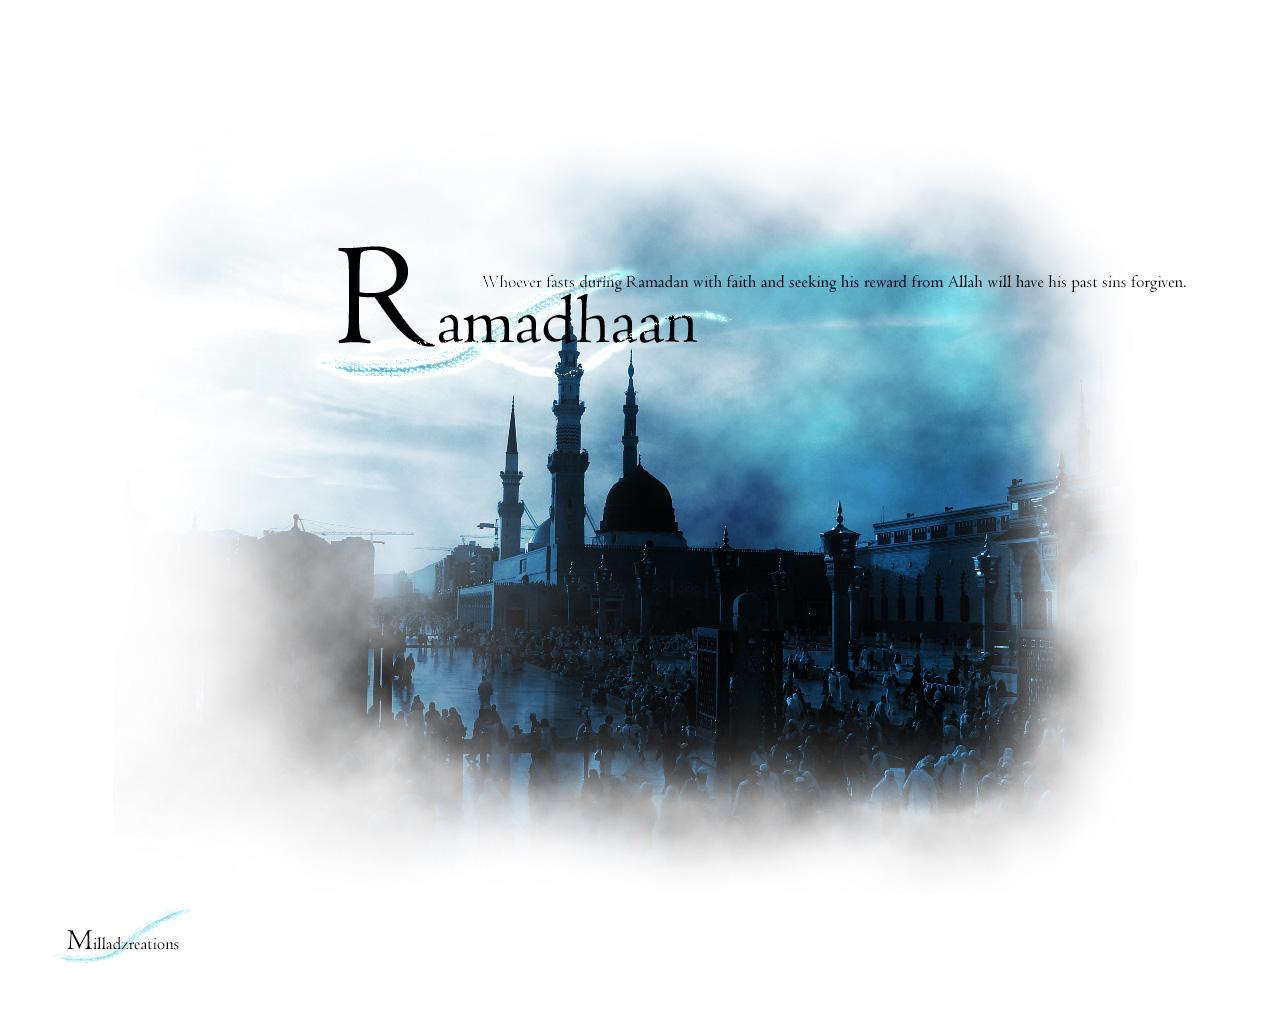 Amazing Reminder Ramadan Wallpaper - wp_s_ramadan-reward_1280x1024  Collection_968479 .jpg